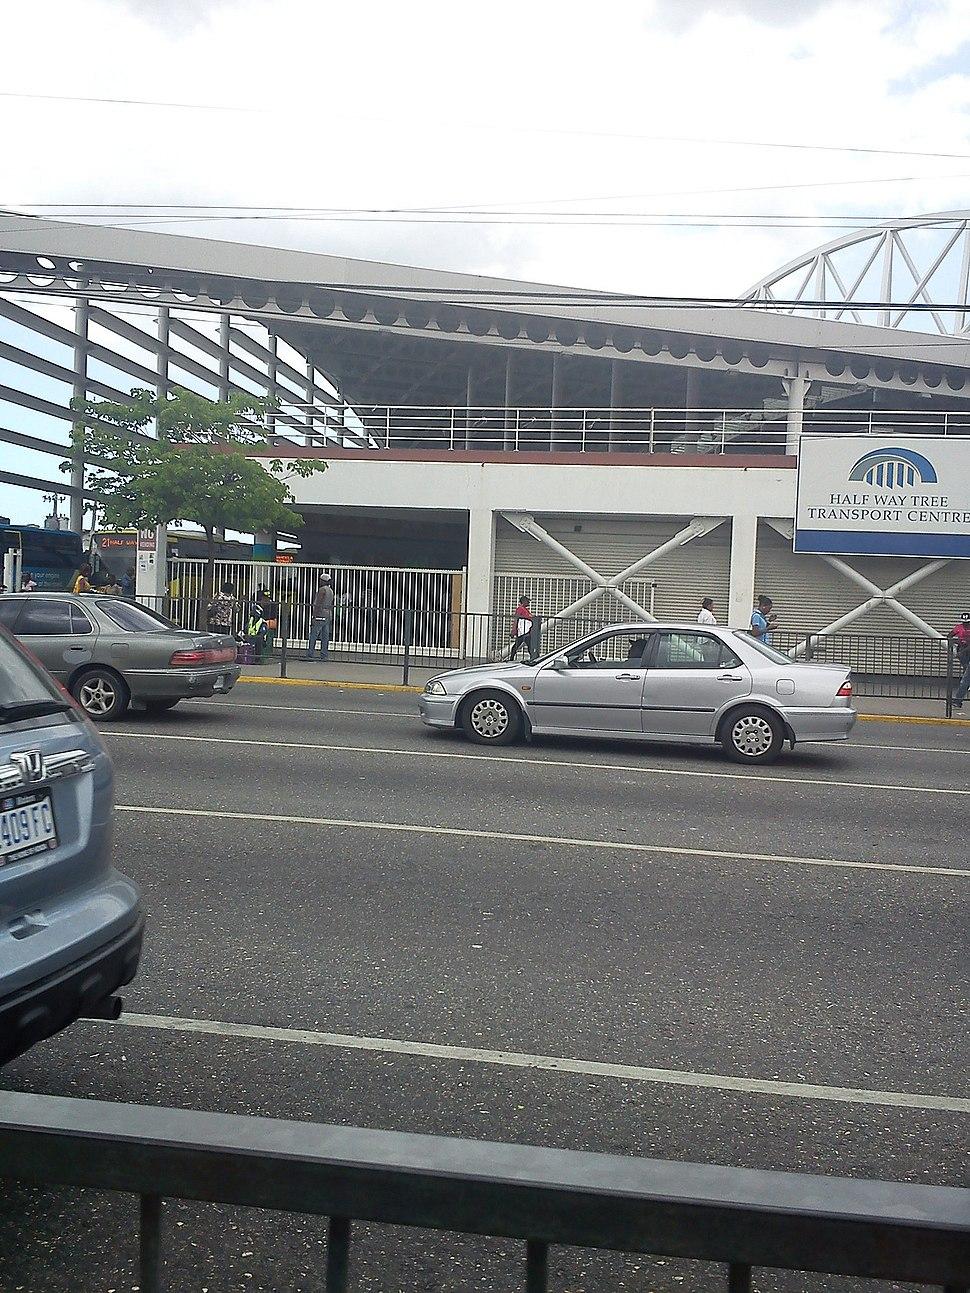 Halfway Tree Transport Center, Kingston, Jamaica.jpg